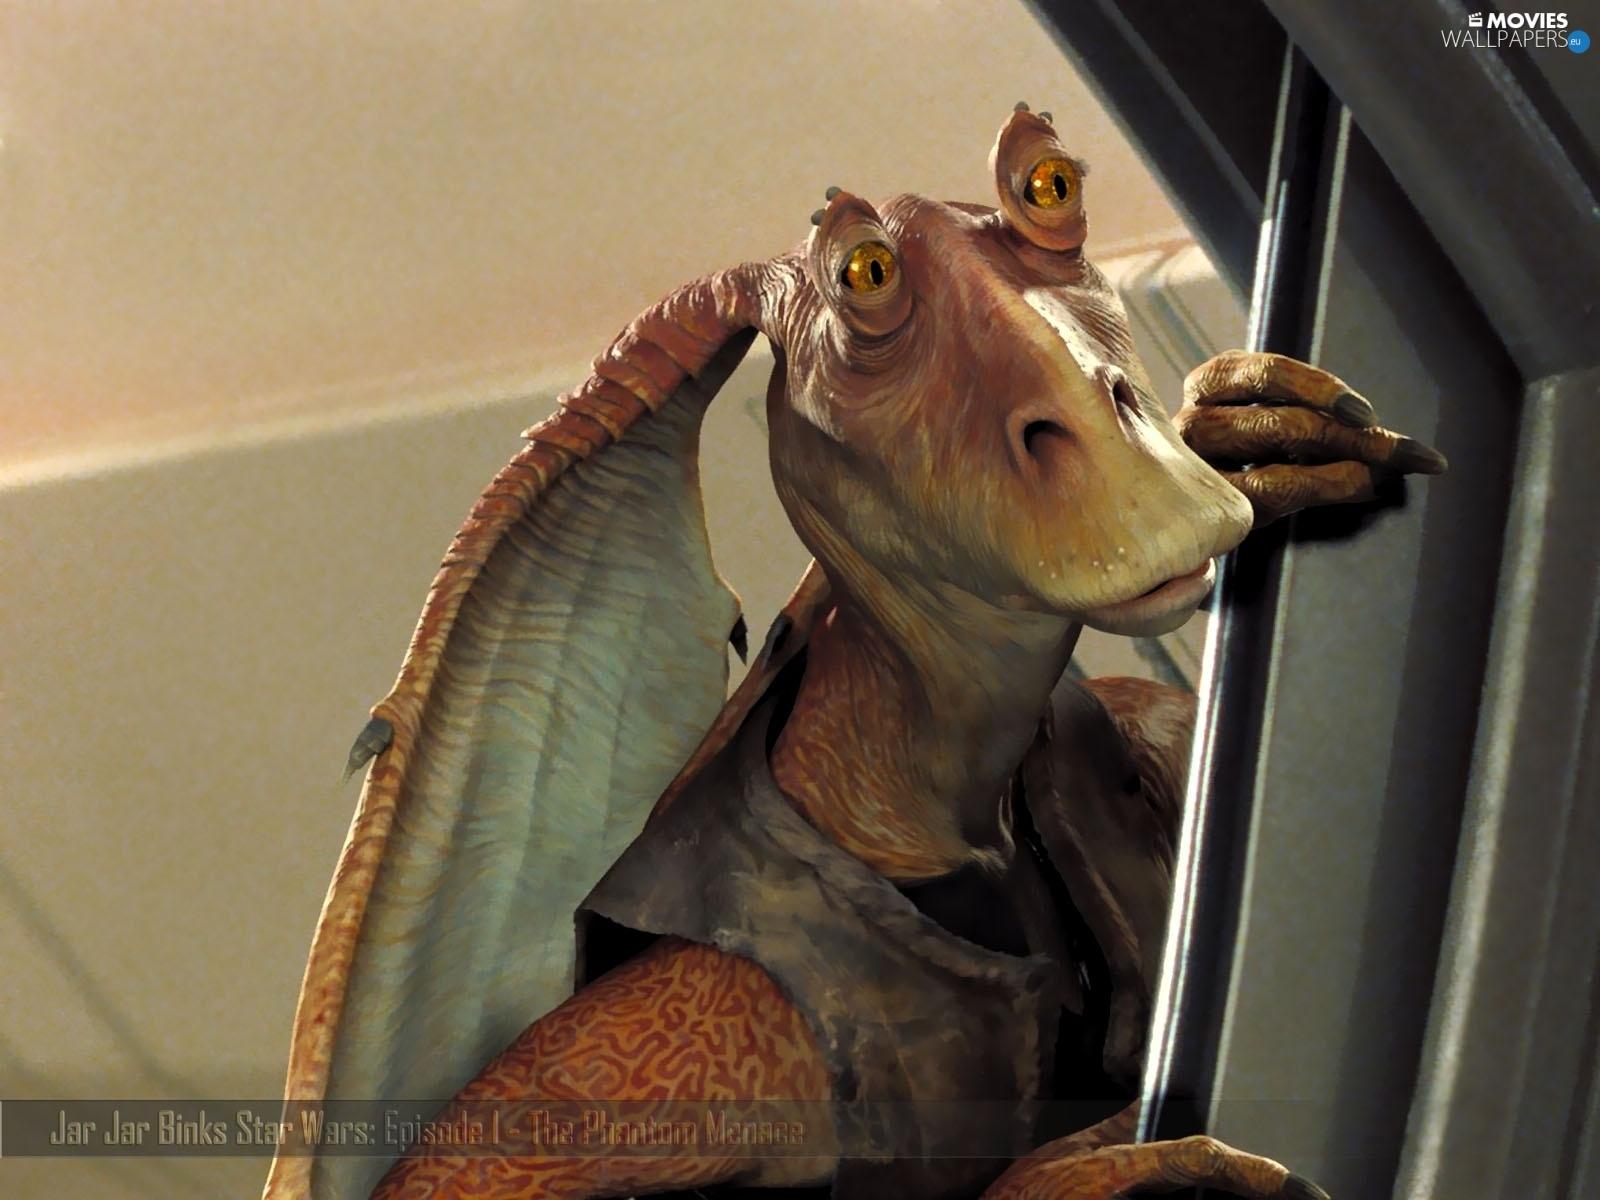 Jar Jar Binks Episode I The Phantom Menace Star Wars Movies Wallpapers 1600x1200